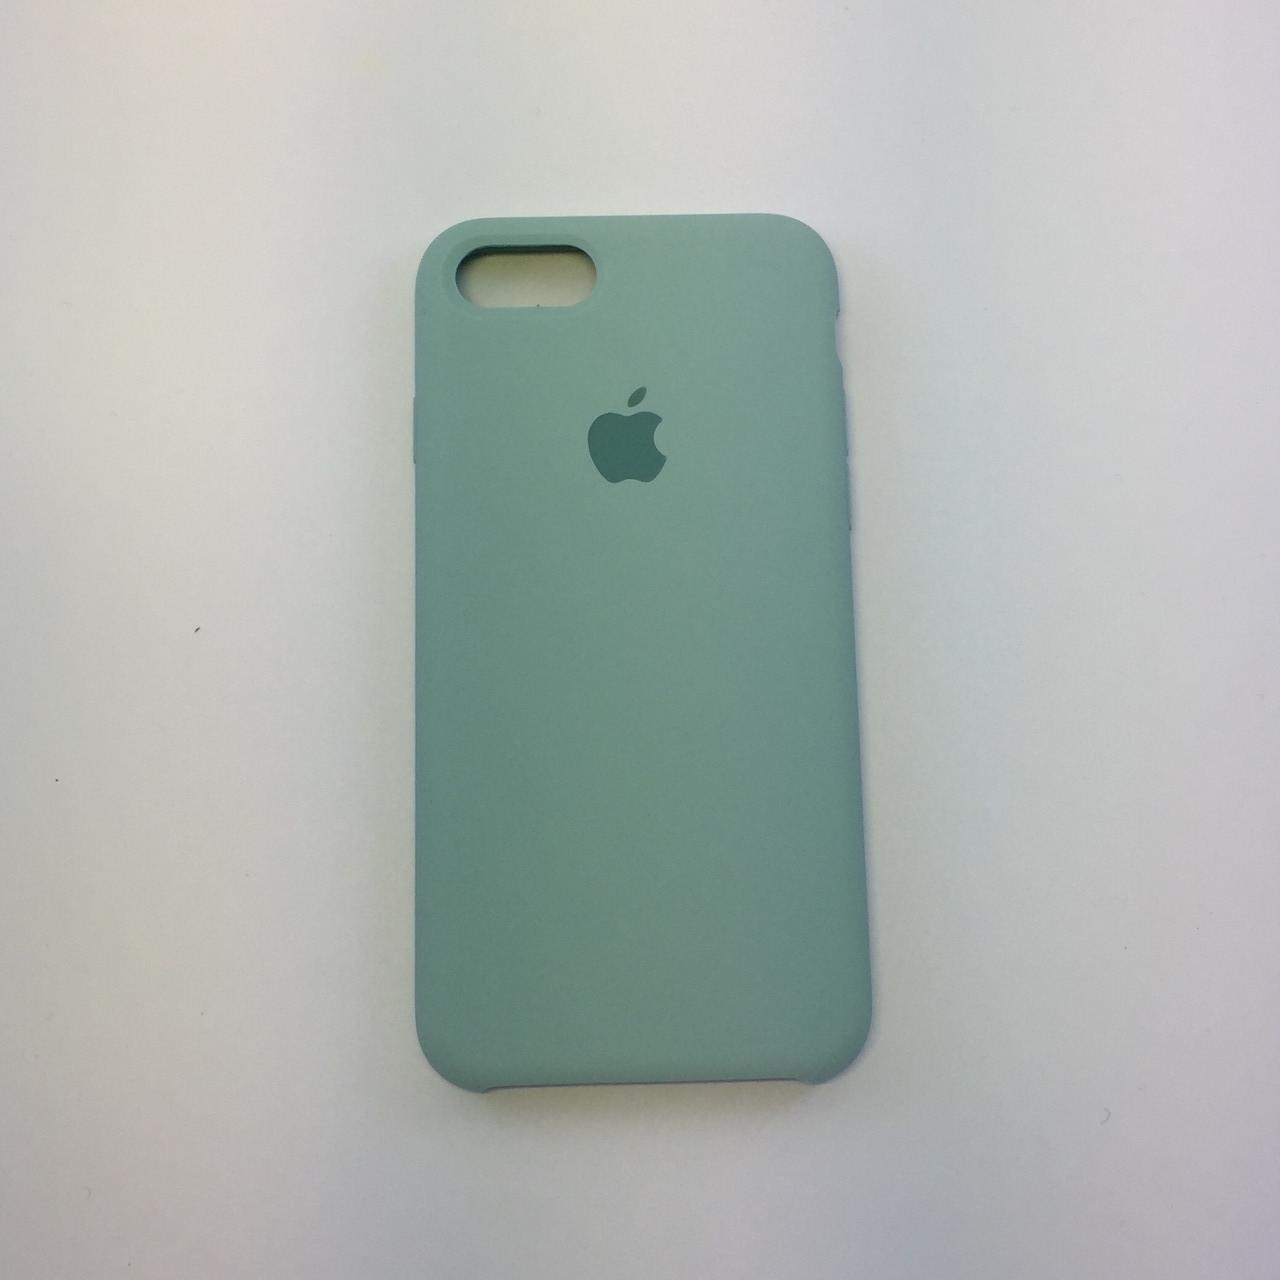 "Чехол - Silicon Case для iPhone ""Мята - №17"" - copy orig."